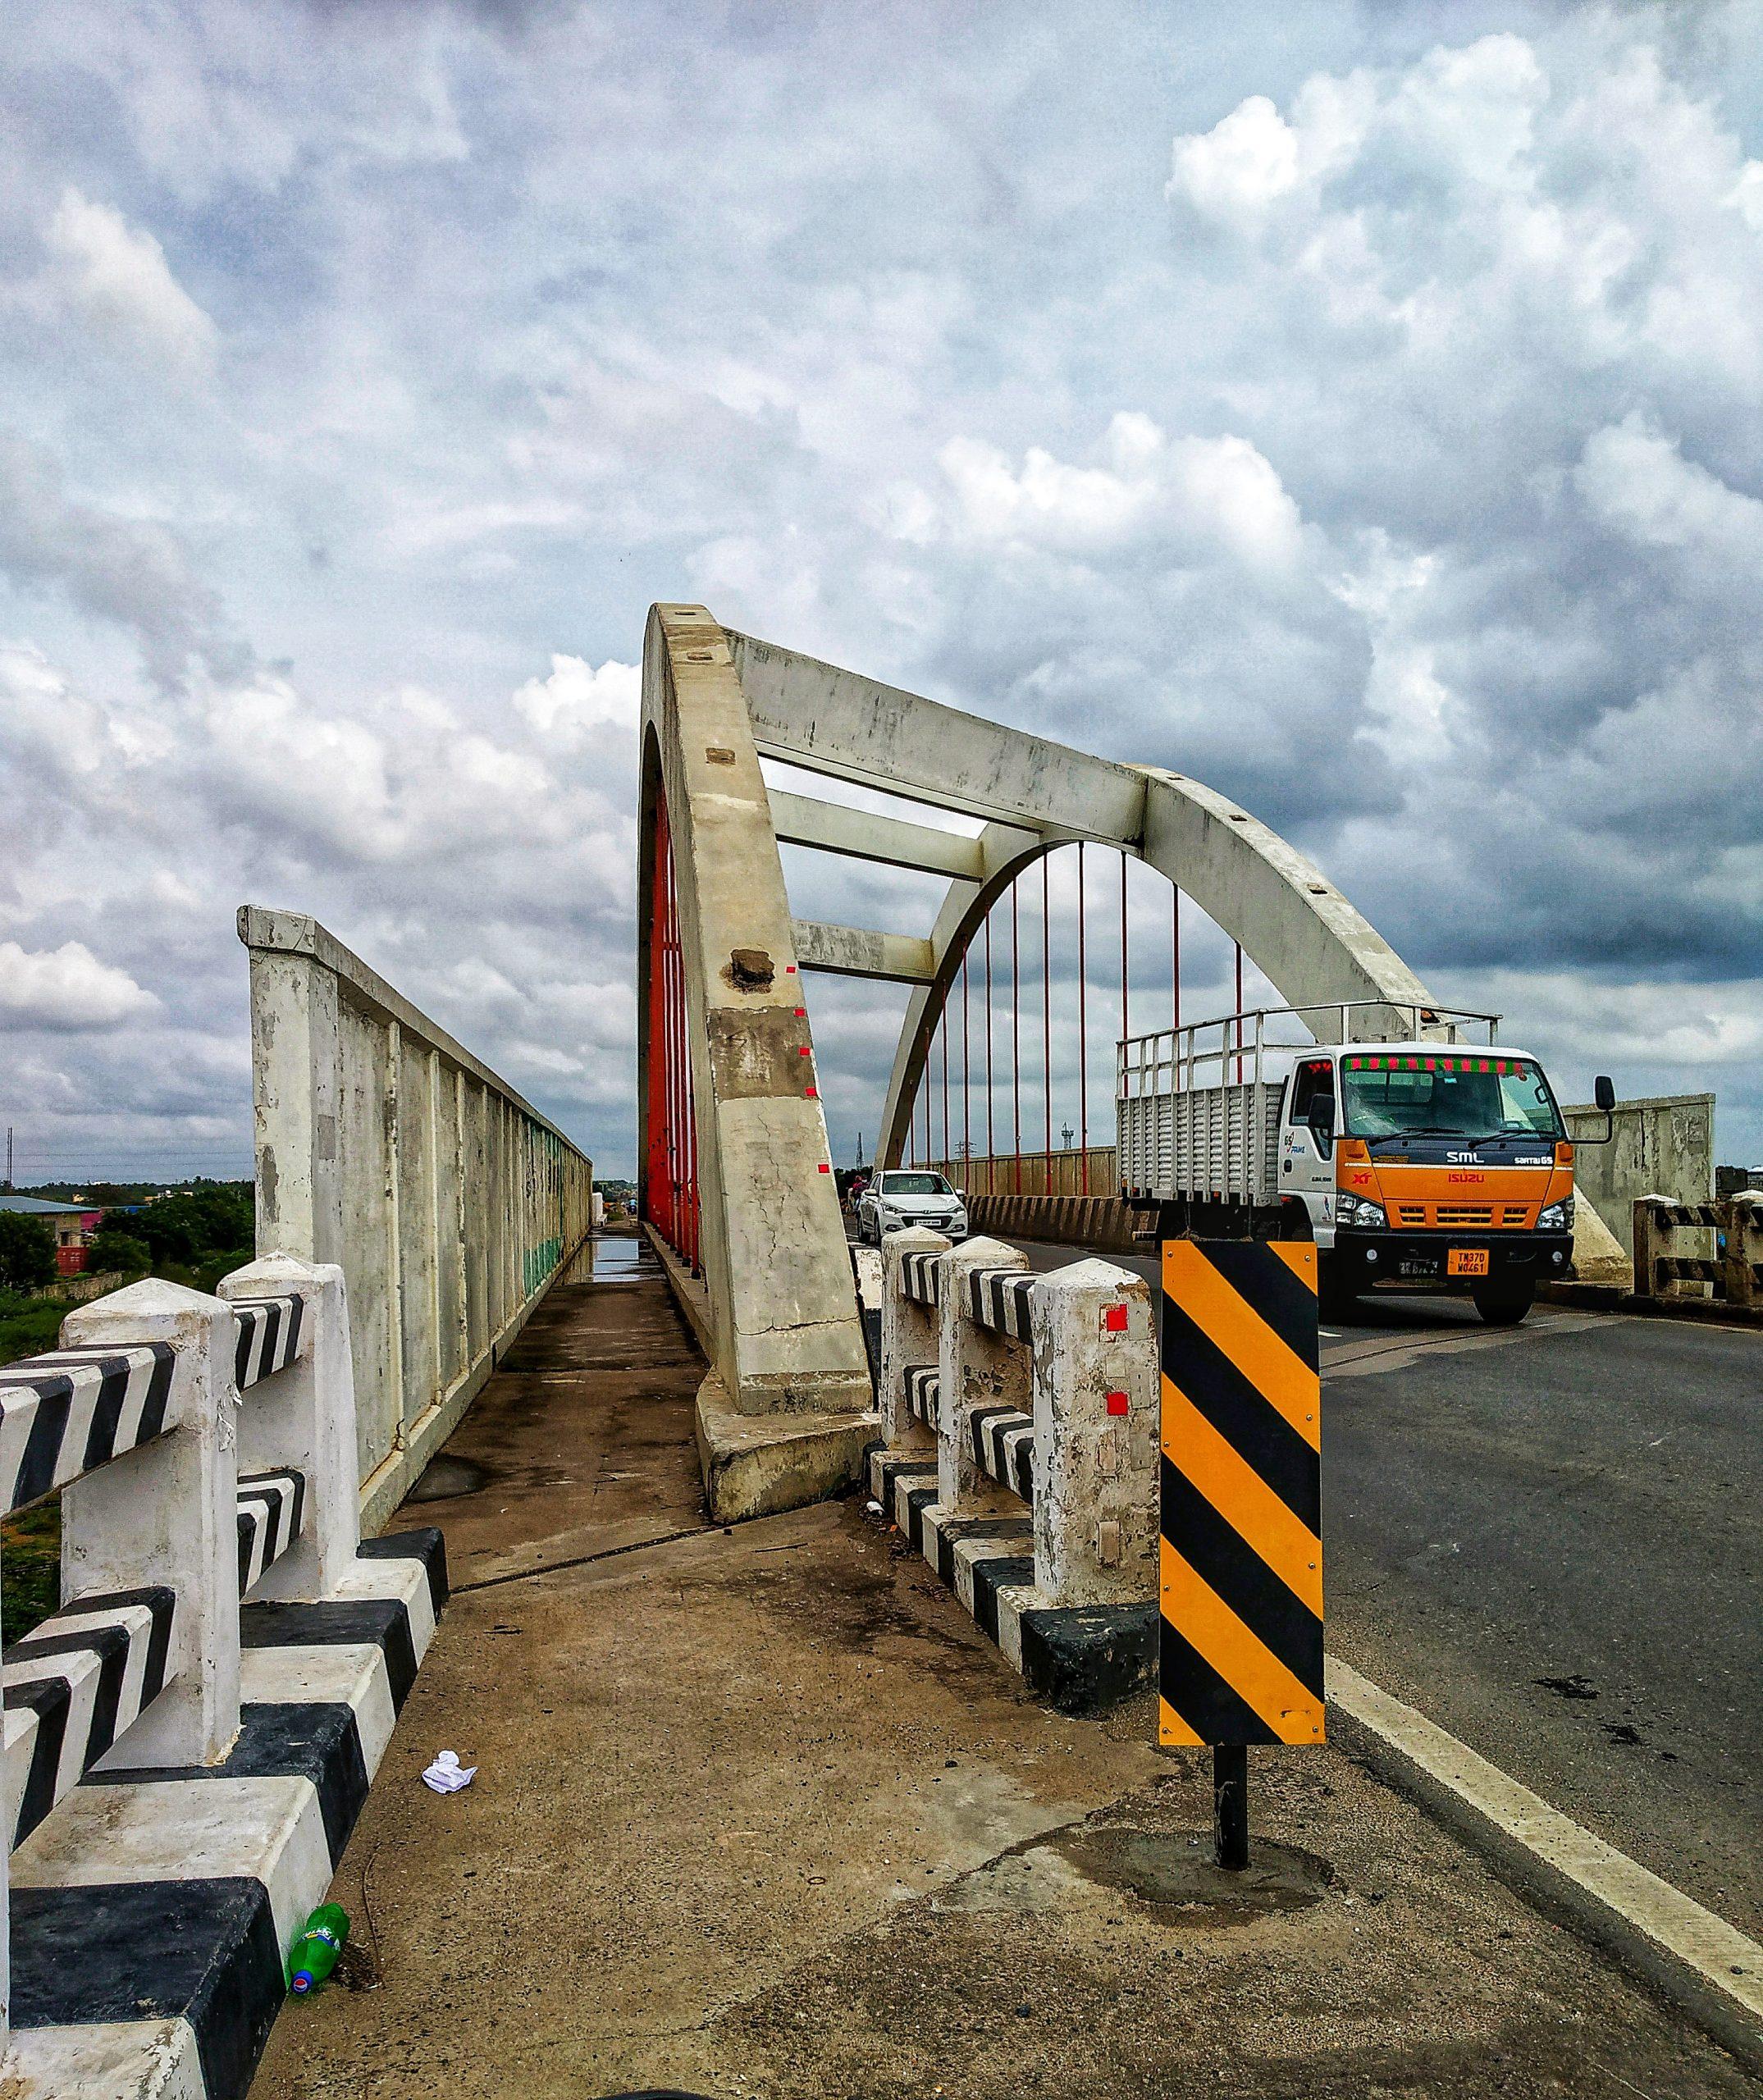 Cable arch bridge